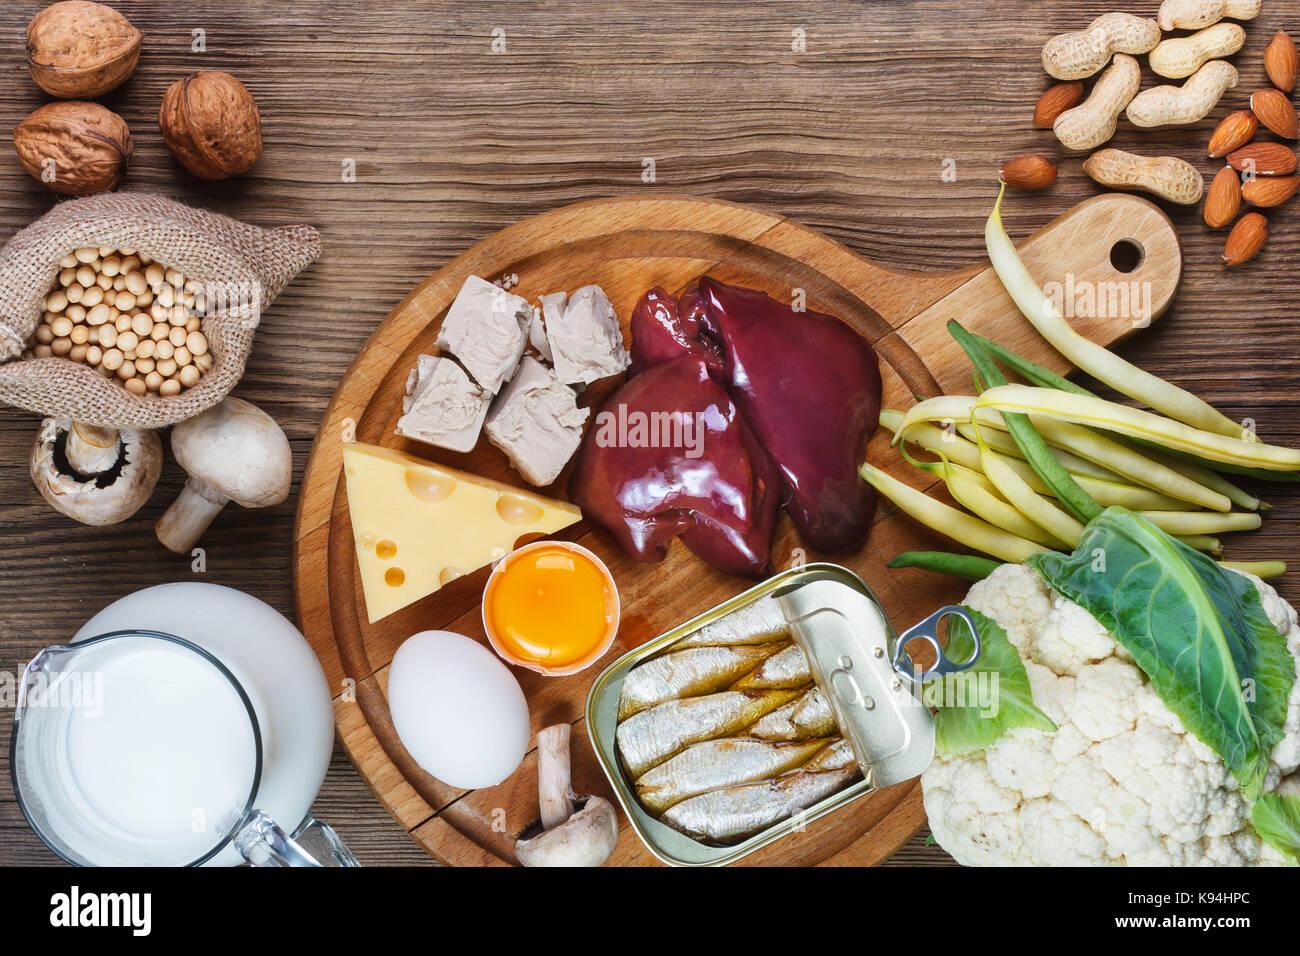 Foods rich in Biotin (vitamin B7). Foods as liver, eggs yolk, yeast, cheese, sardines, soybeans, milk, cauliflower, - Stock Image